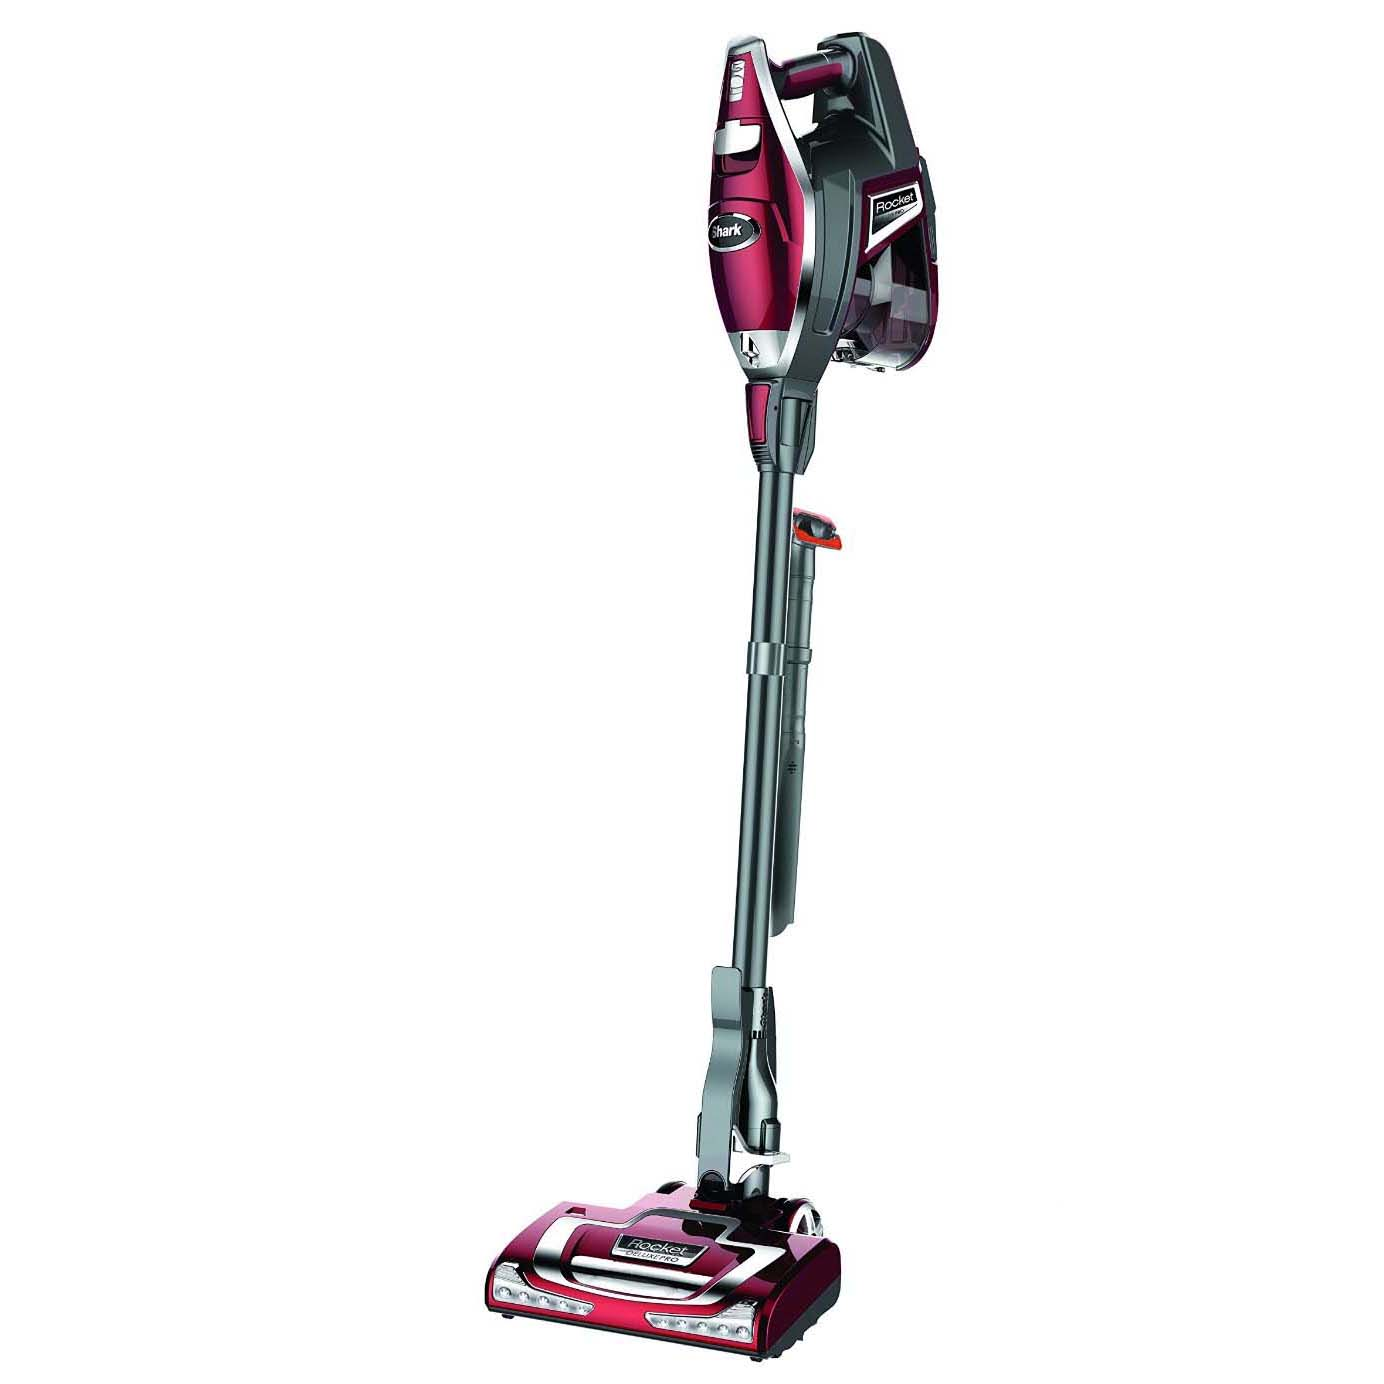 Bed bath and beyond vacuum cleaner - Shark Rocket Ultralight Vacuum Rotator Lift Away Red Certified Refurbished Walmart Com